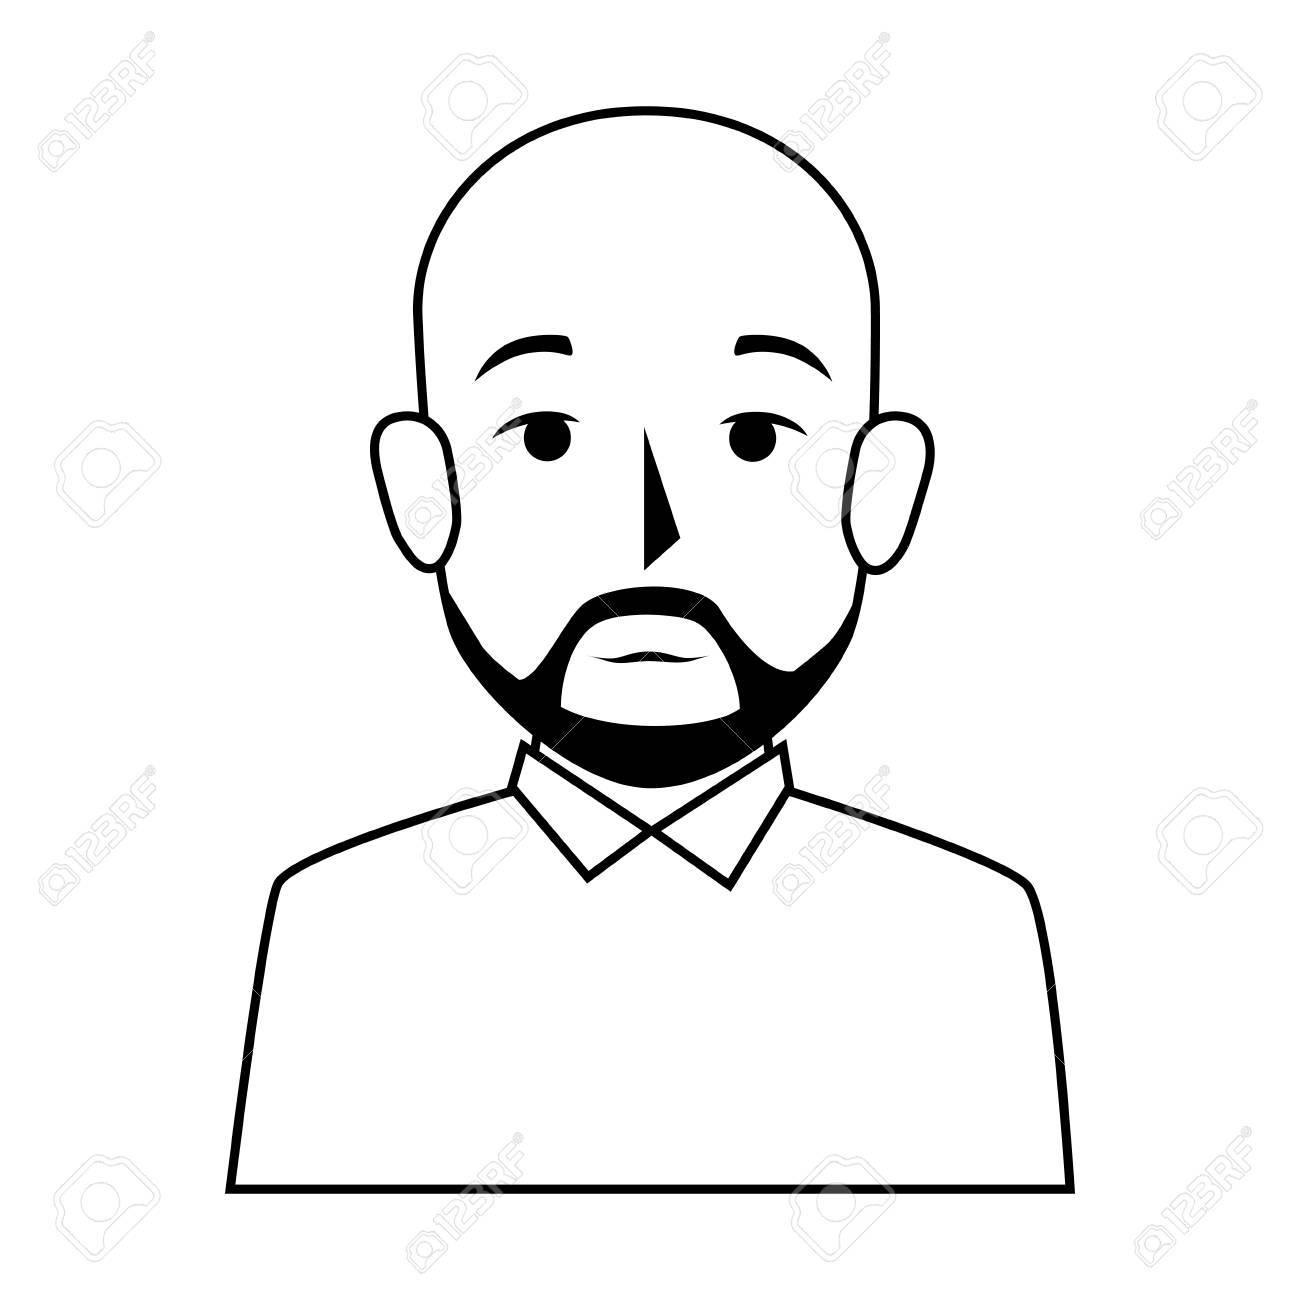 Silhouette at getdrawings com. Beard clipart bearded man